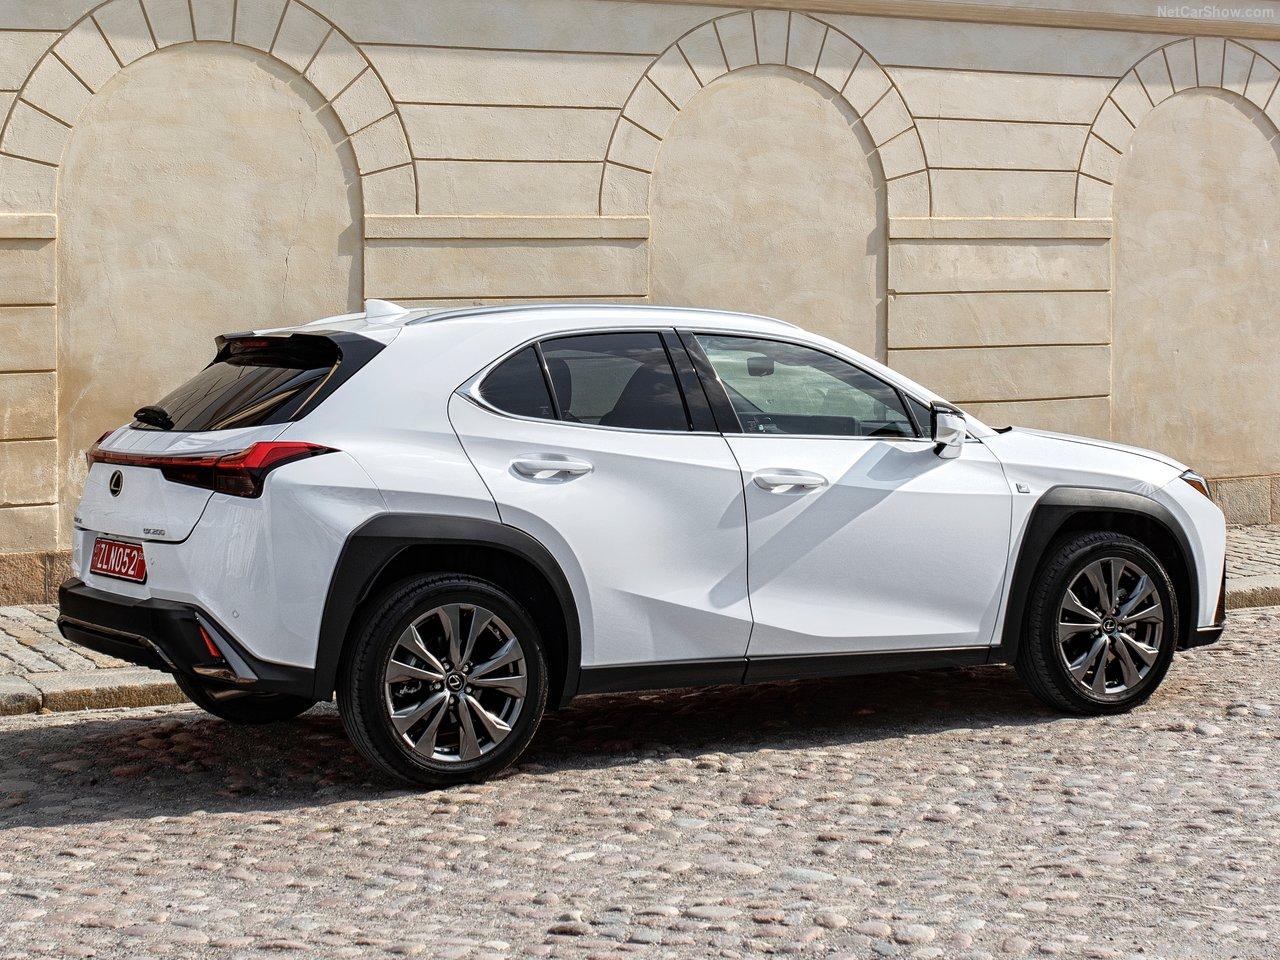 Lexus-UX-2019-1280-4d.jpg